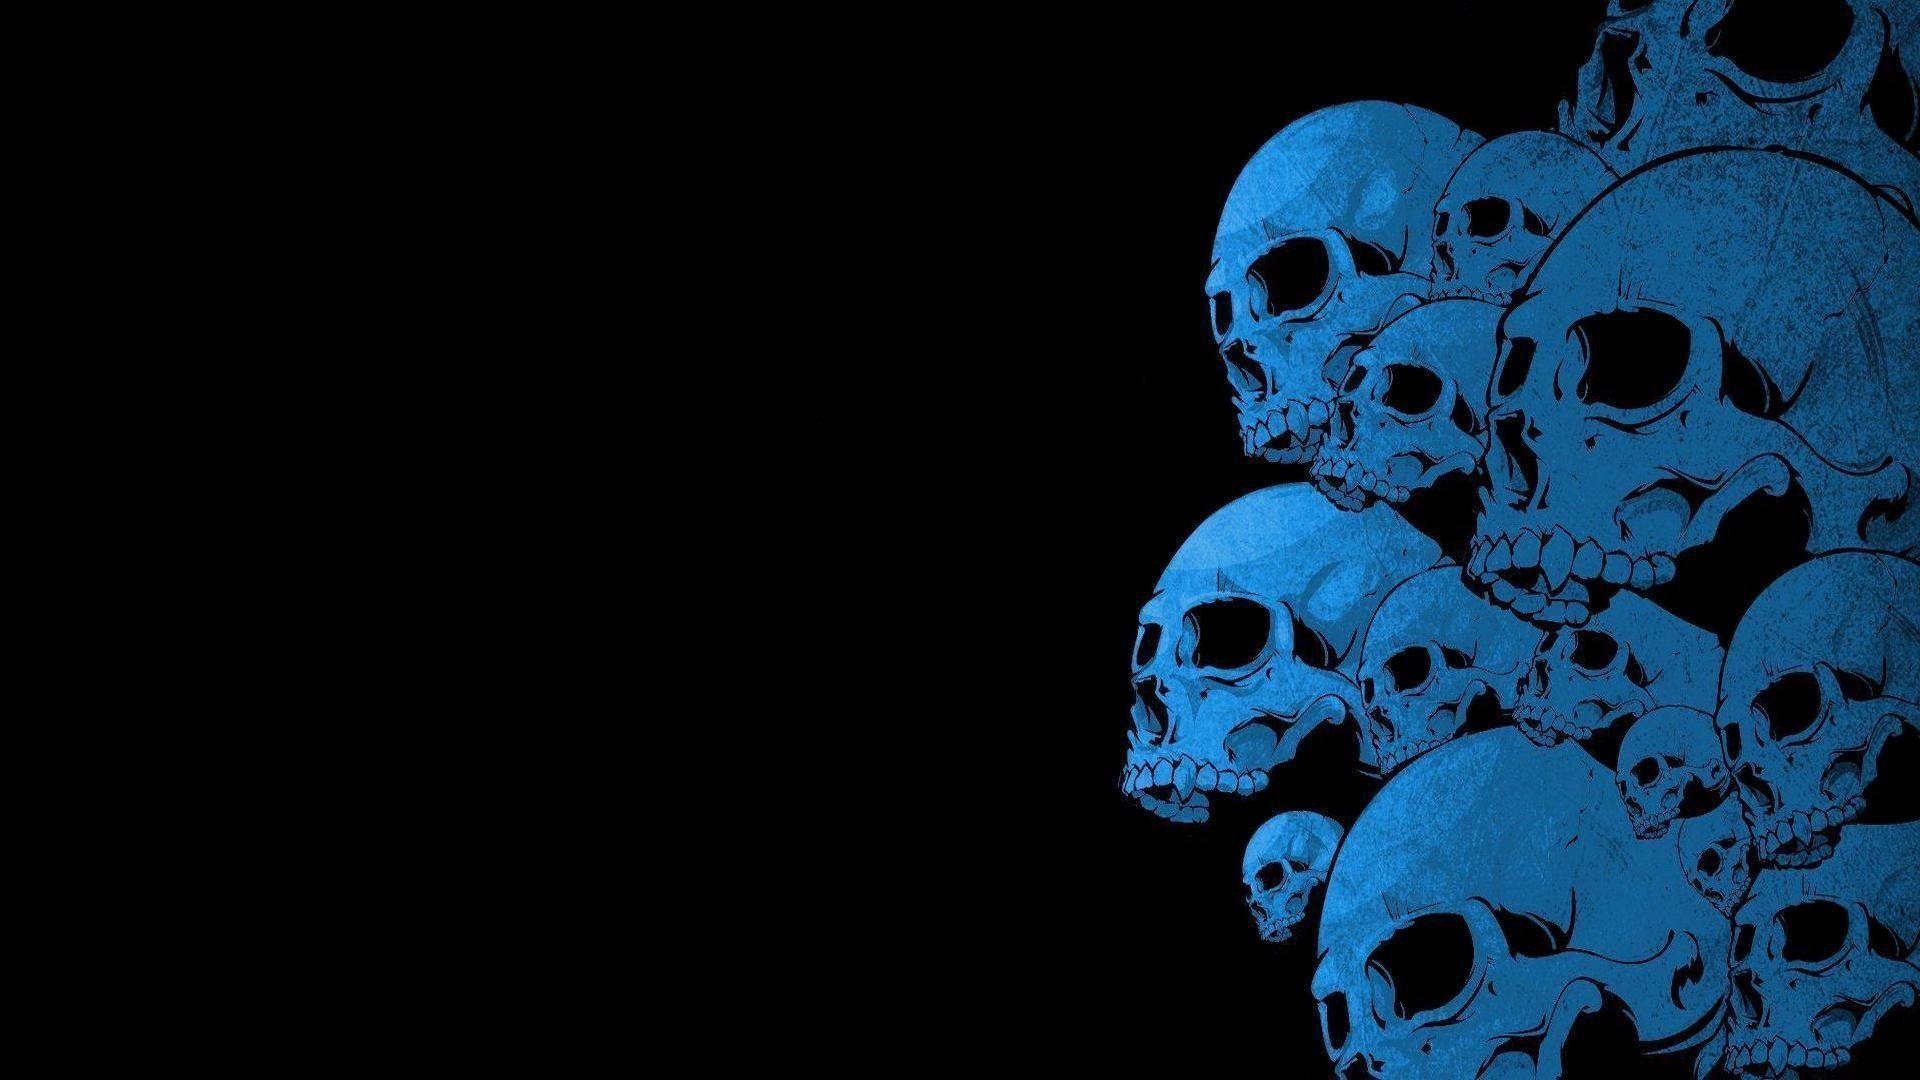 Punisher Skull Graphics | Punisher Skull Pics – HD Wallpapers .